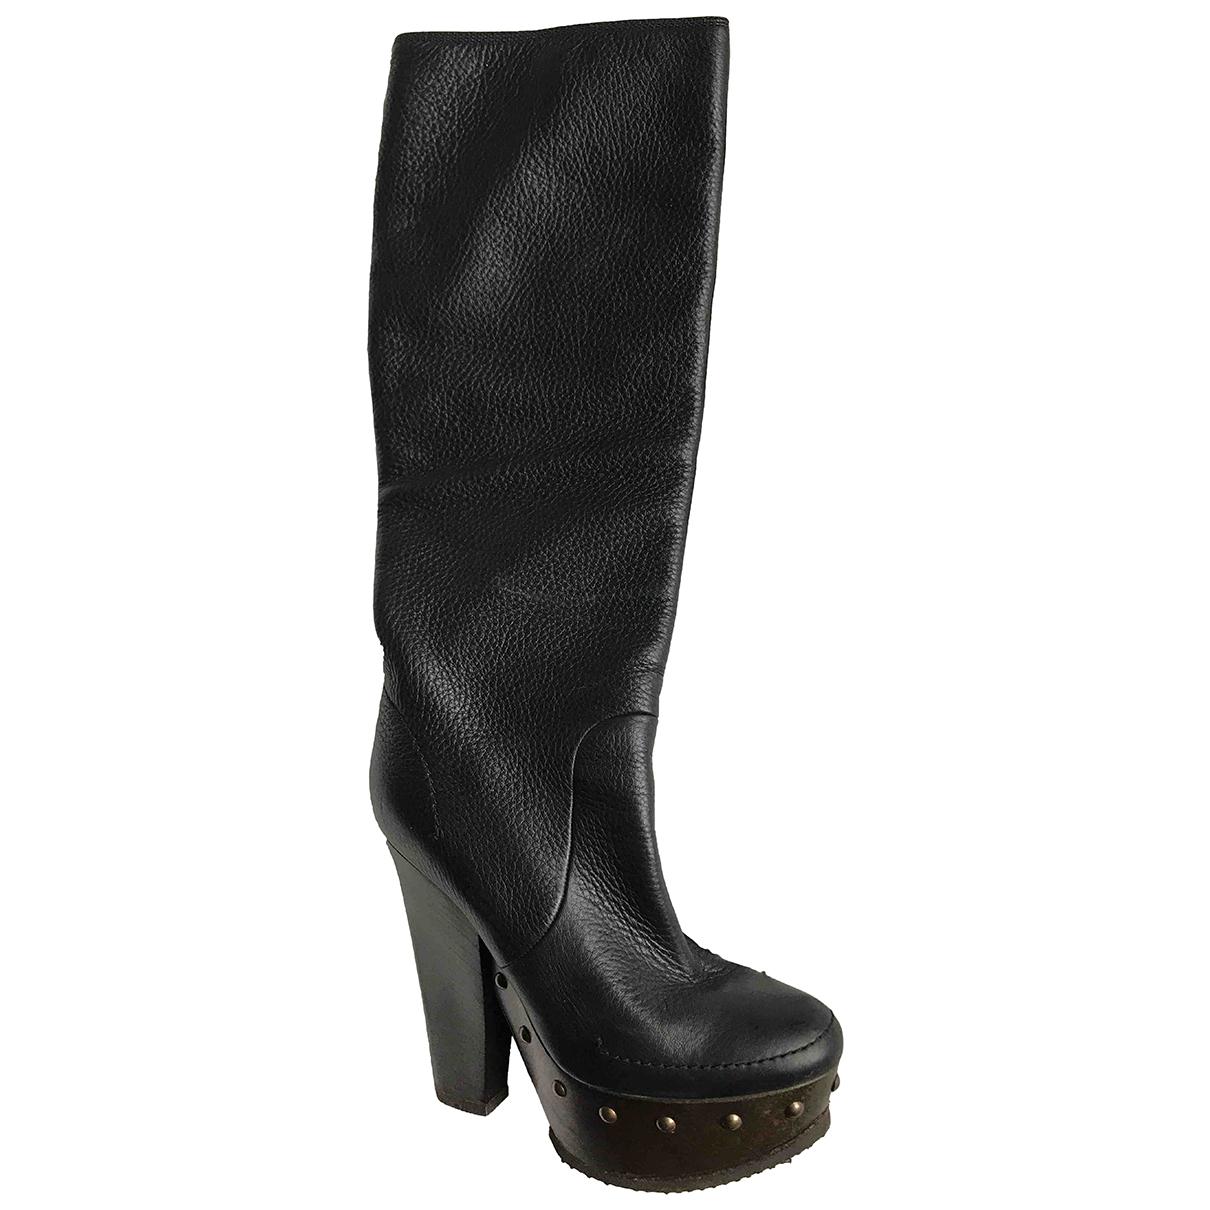 Lanvin N Black Leather Boots for Women 37 EU